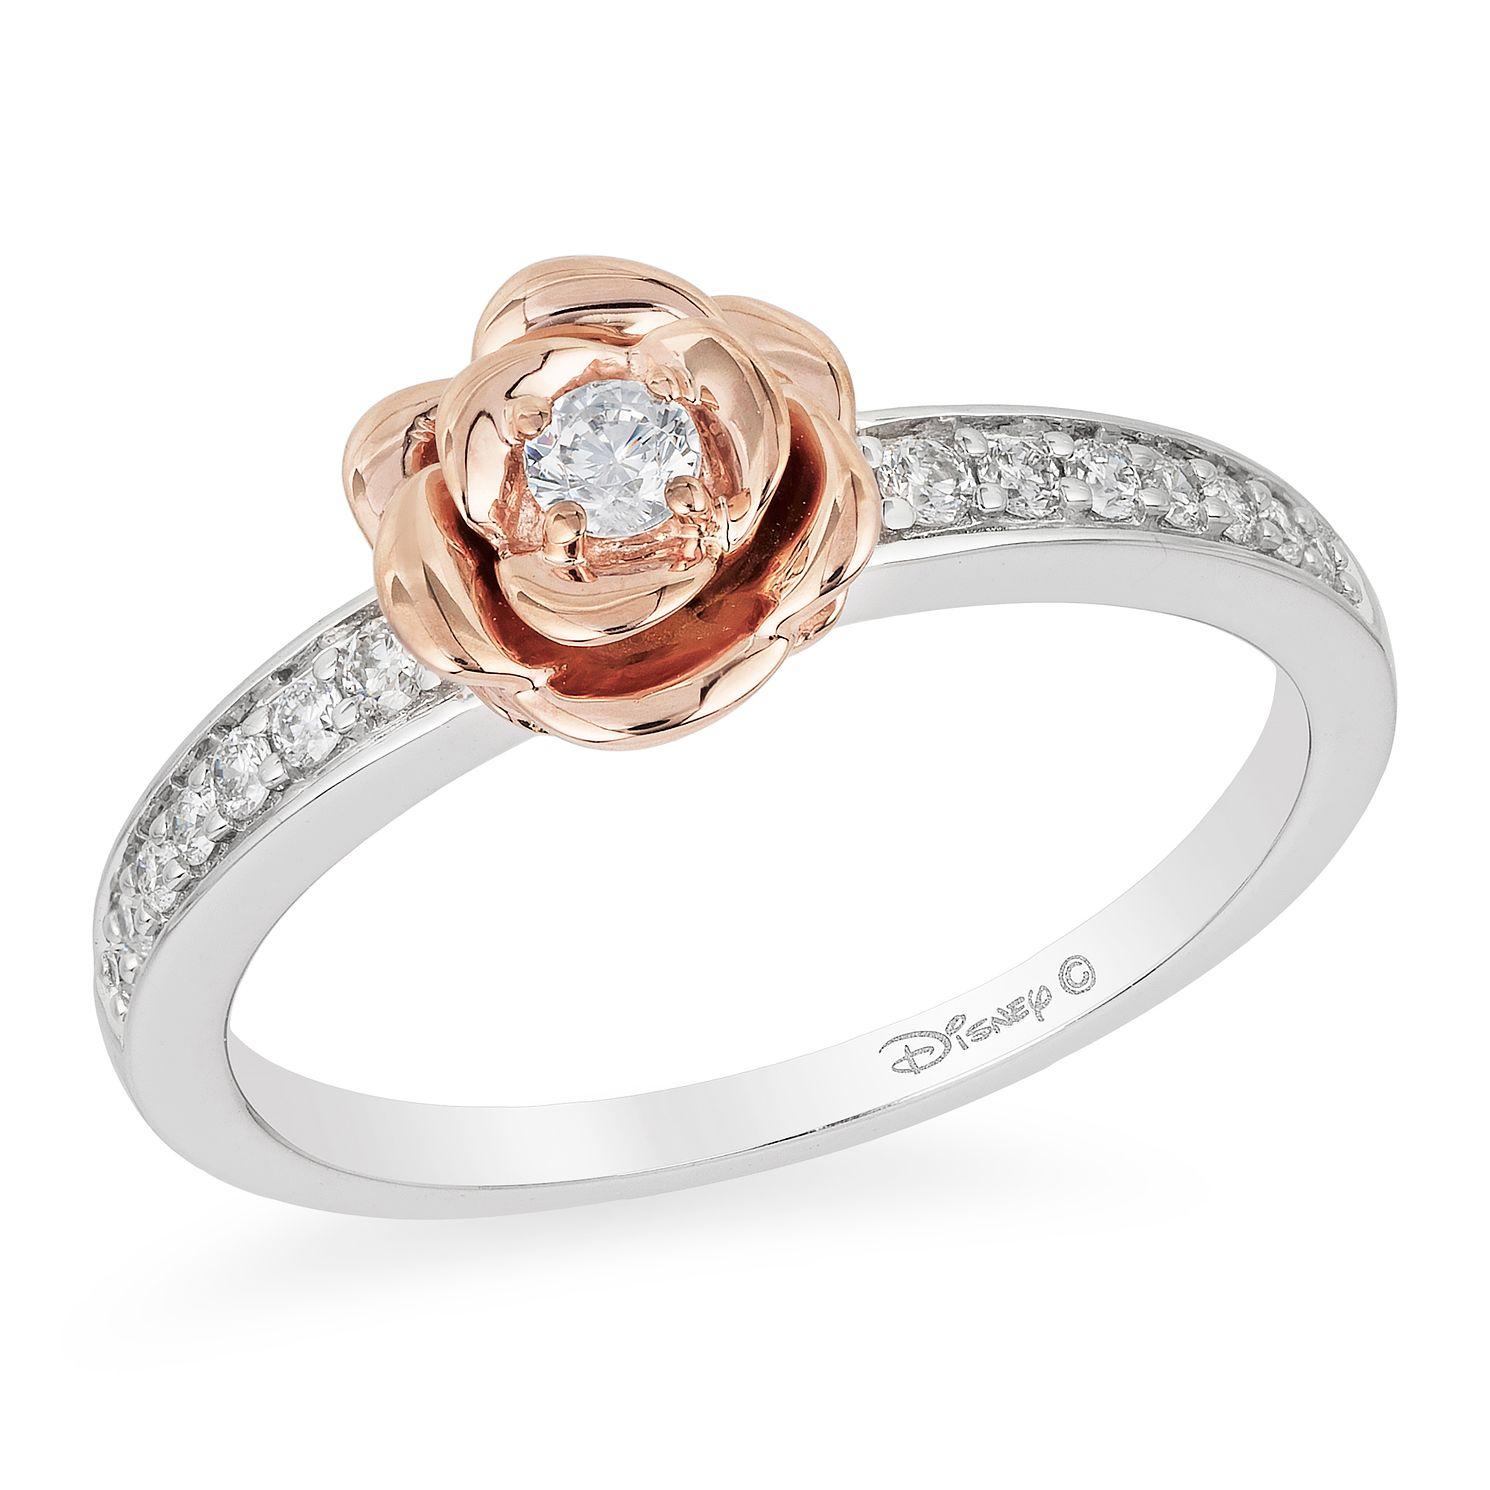 Enchanted Disney Silver 9ct Rose Gold Diamond Belle Ring